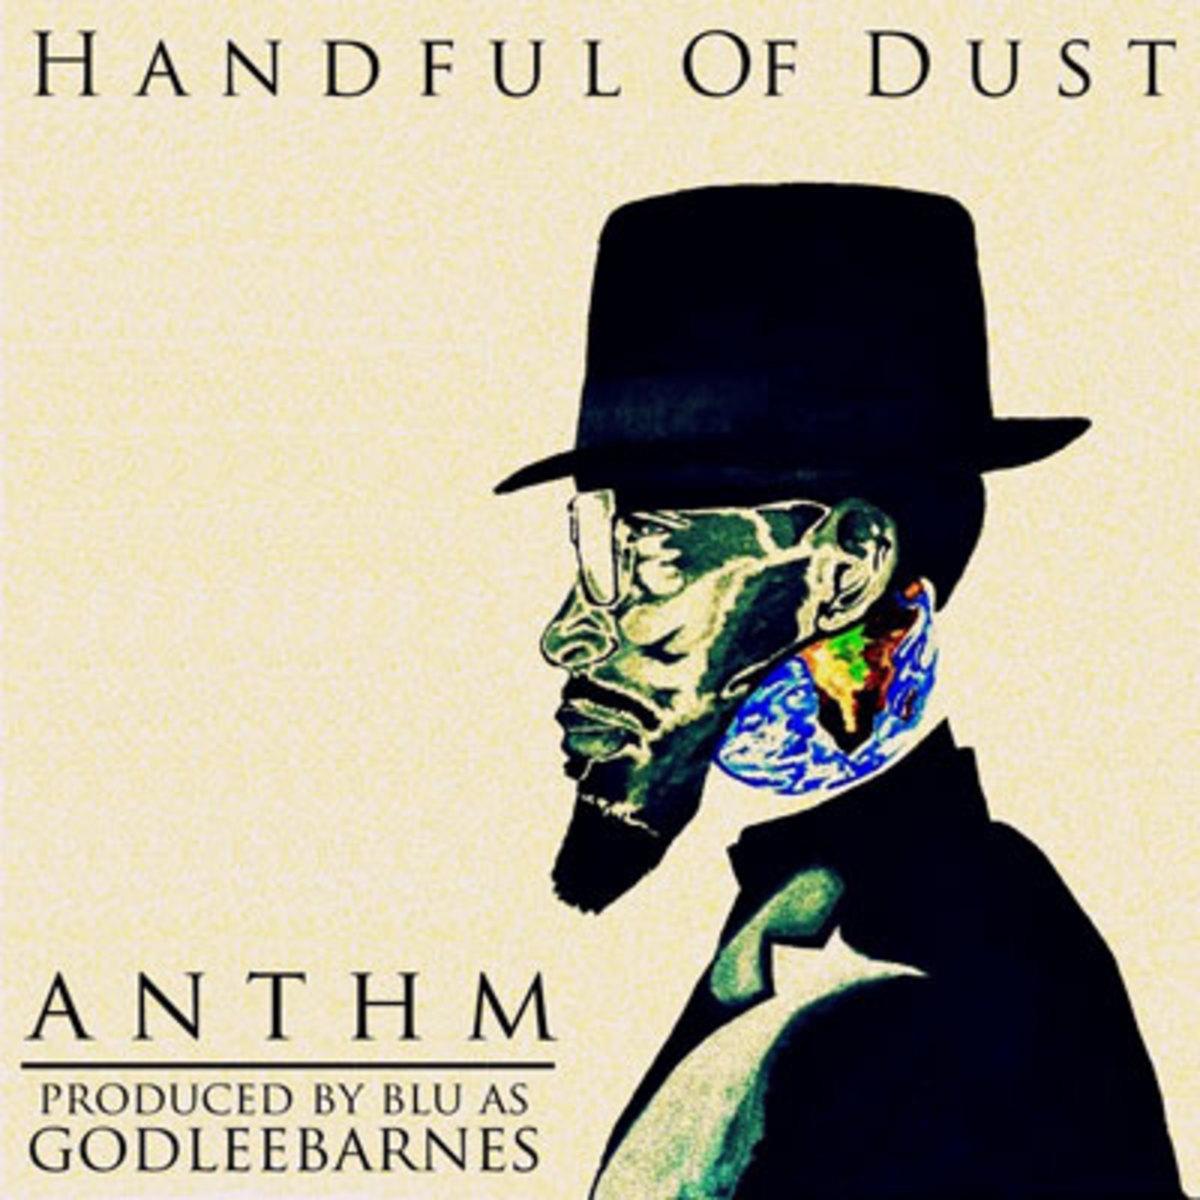 anthm-handfulofdust.jpg